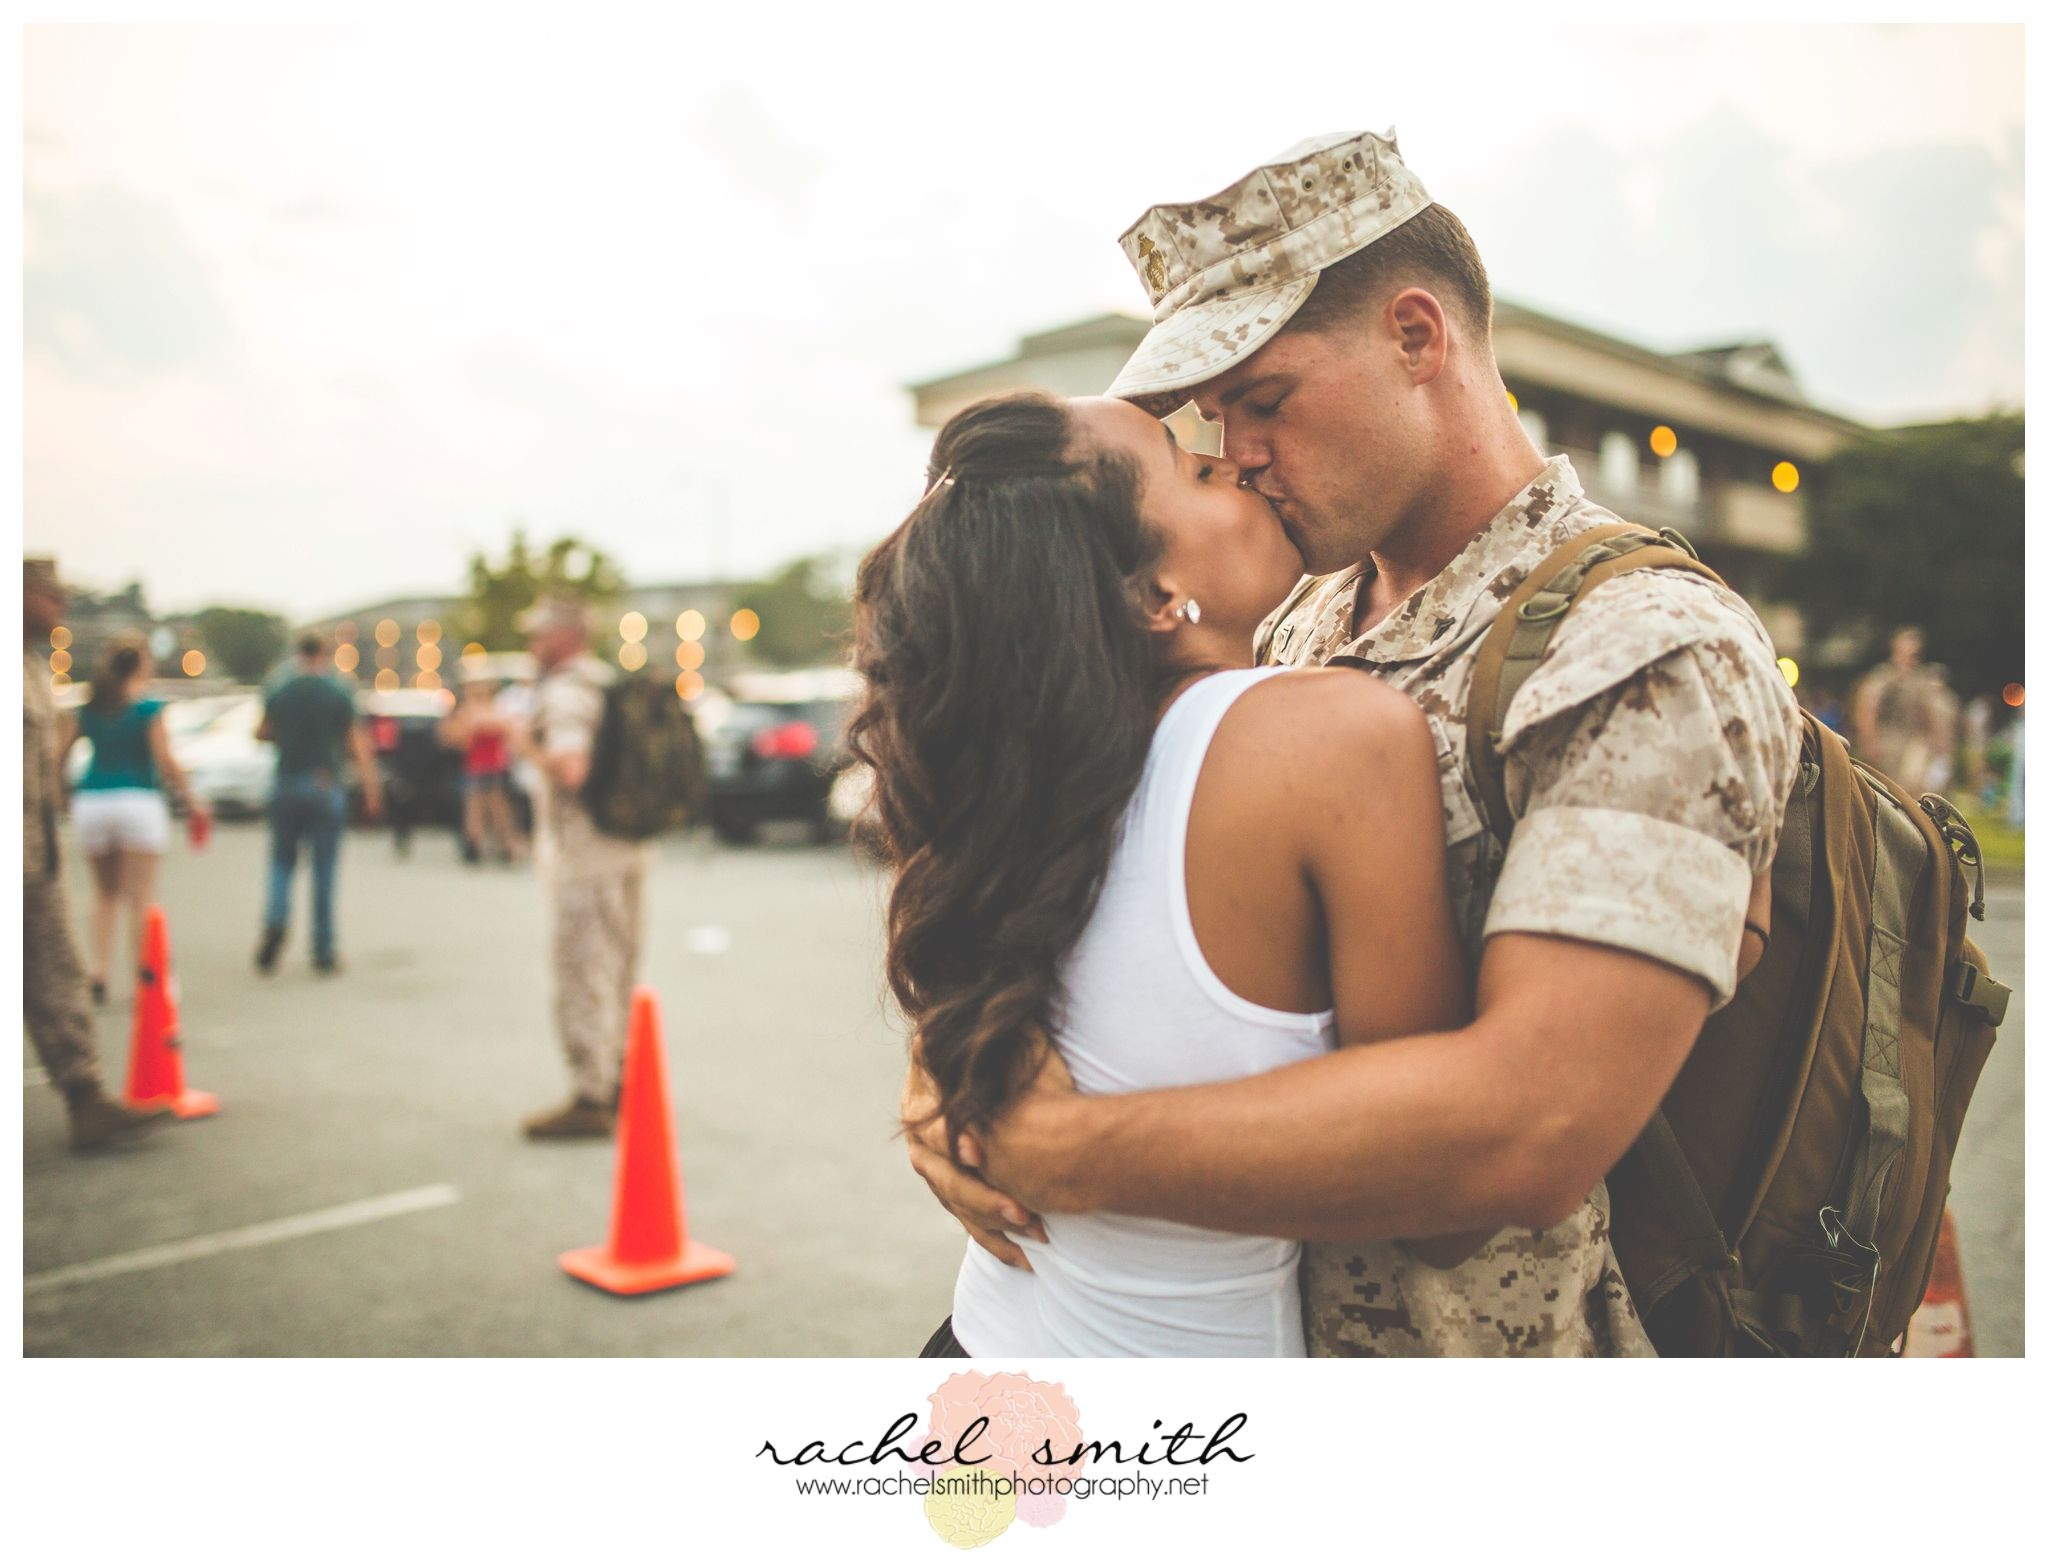 Military Homecoming, Marine Corps Homecoming, Camp Lejeune NC, Military, Rachel Smith Photography, Jacksonville NC Homecoming Photographer